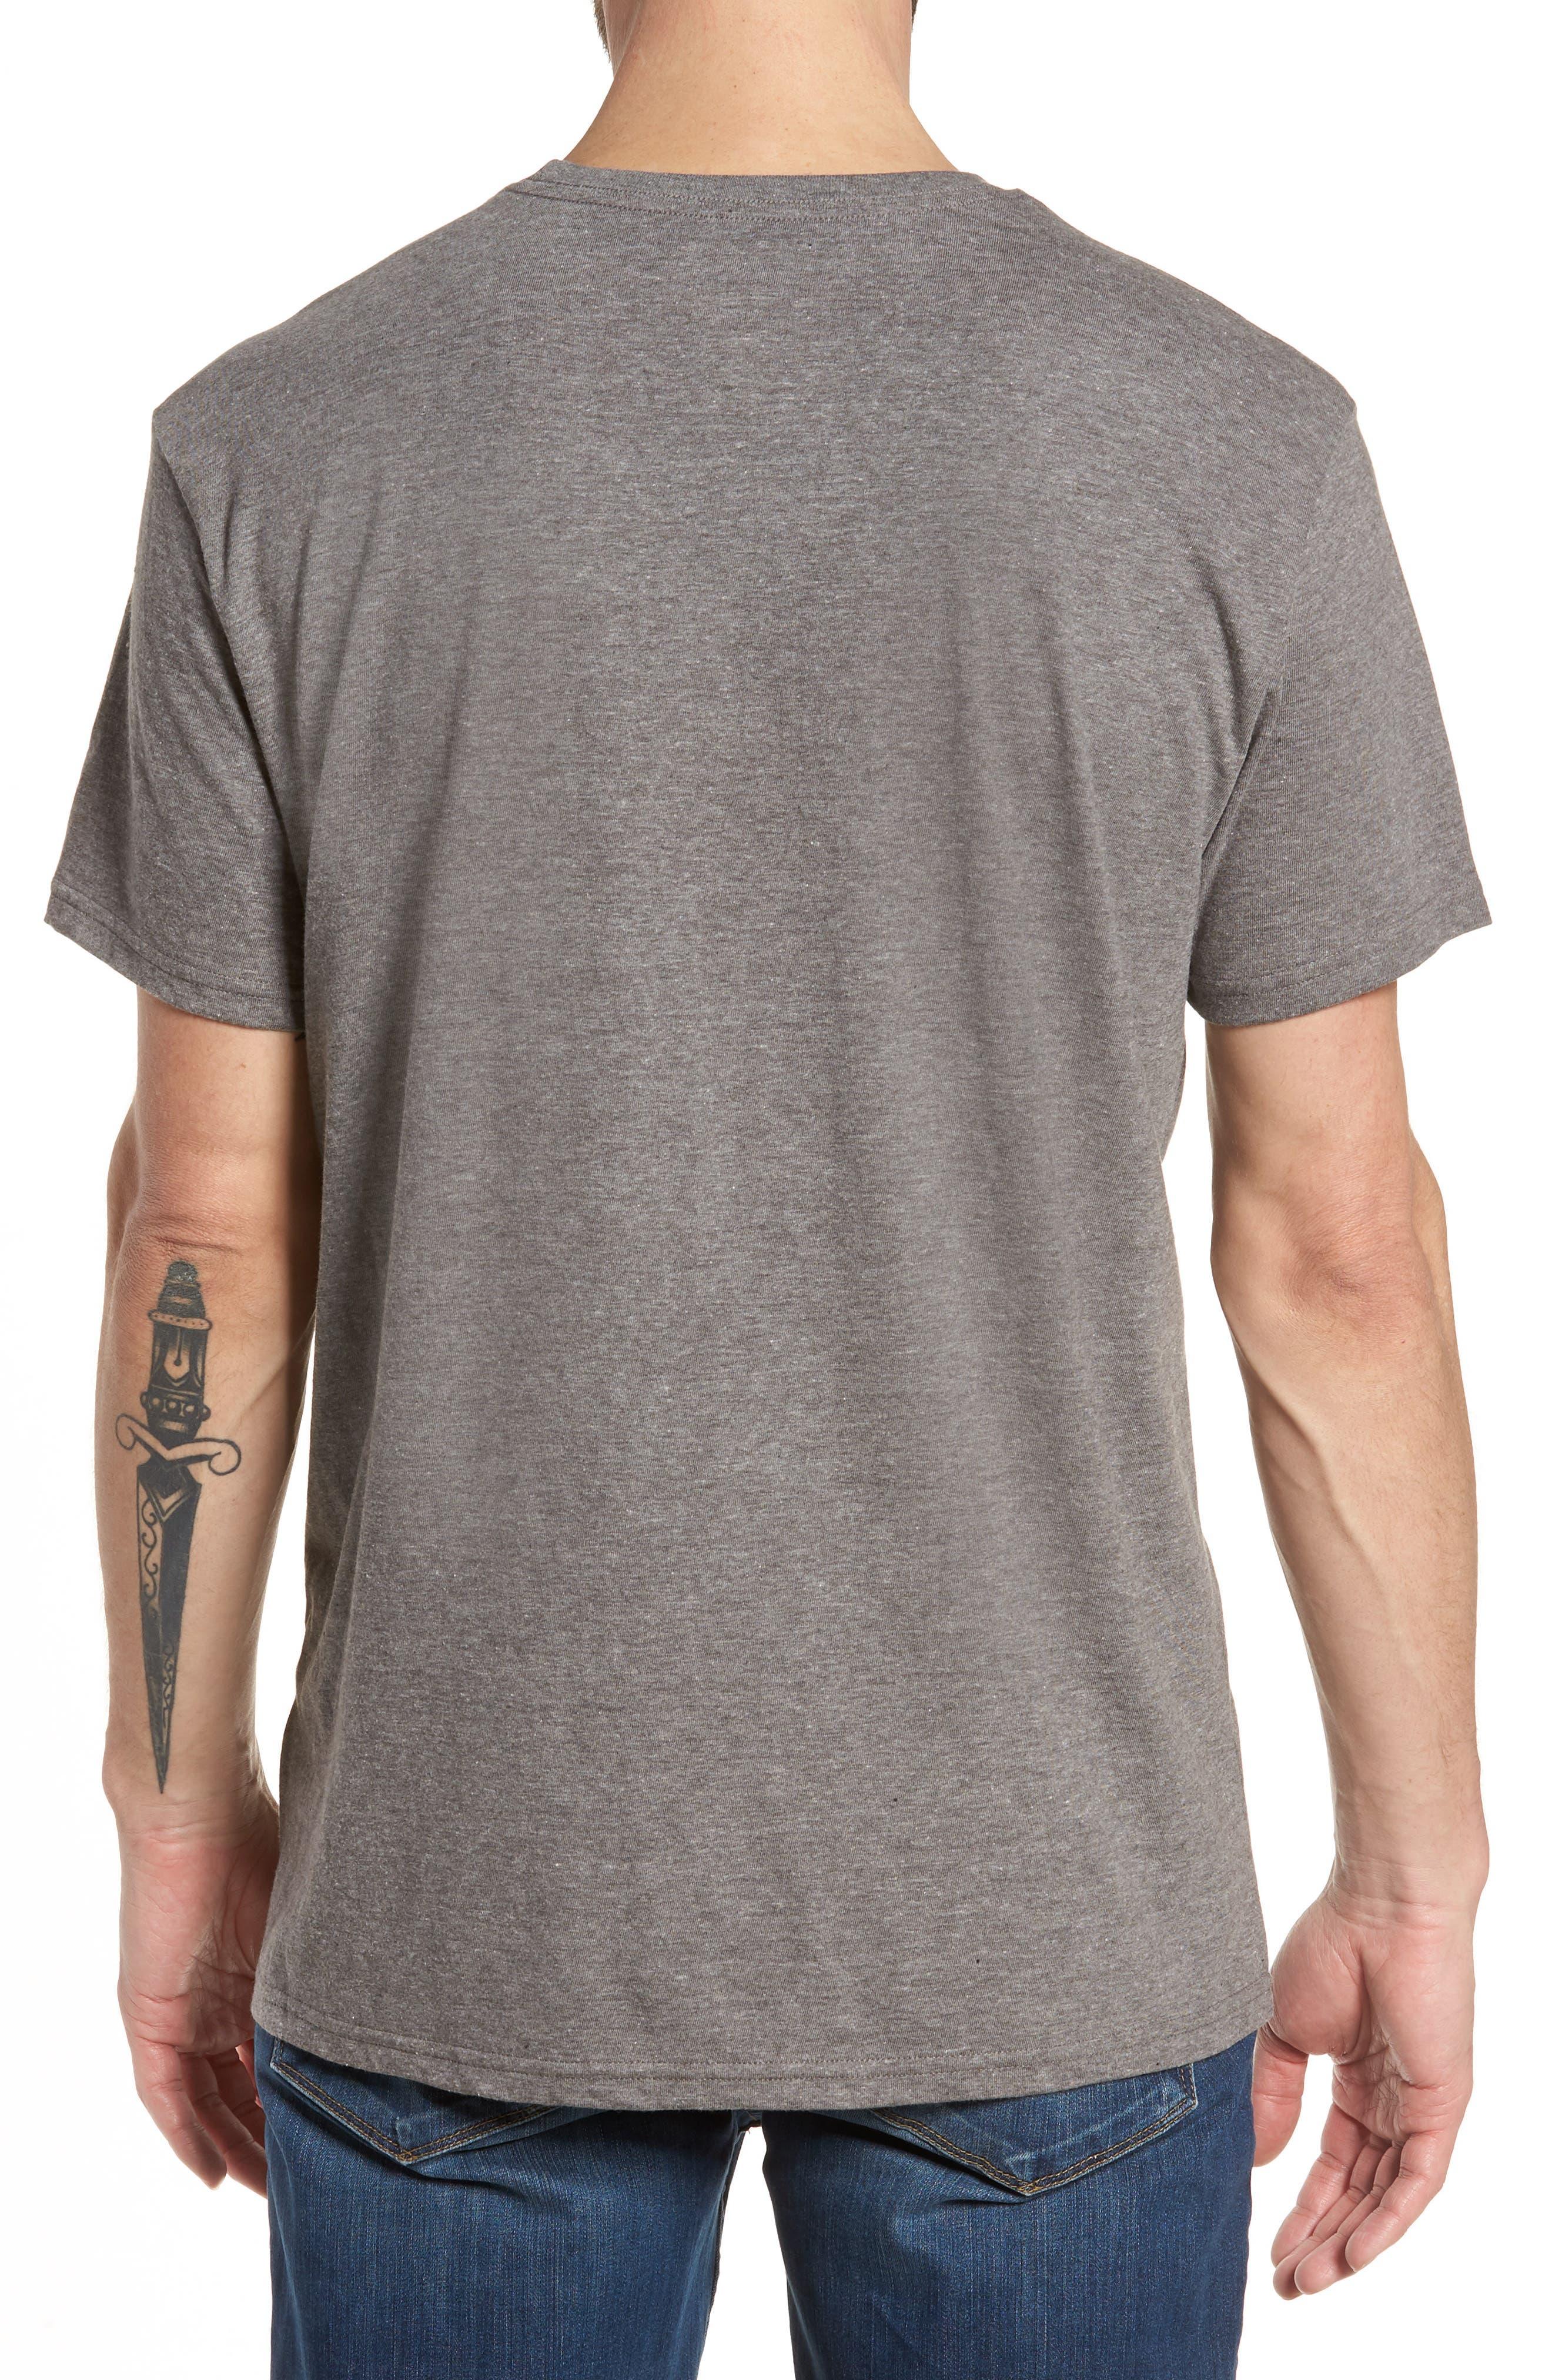 Inverse Graphic T-Shirt,                             Alternate thumbnail 2, color,                             Dark Grey Heather